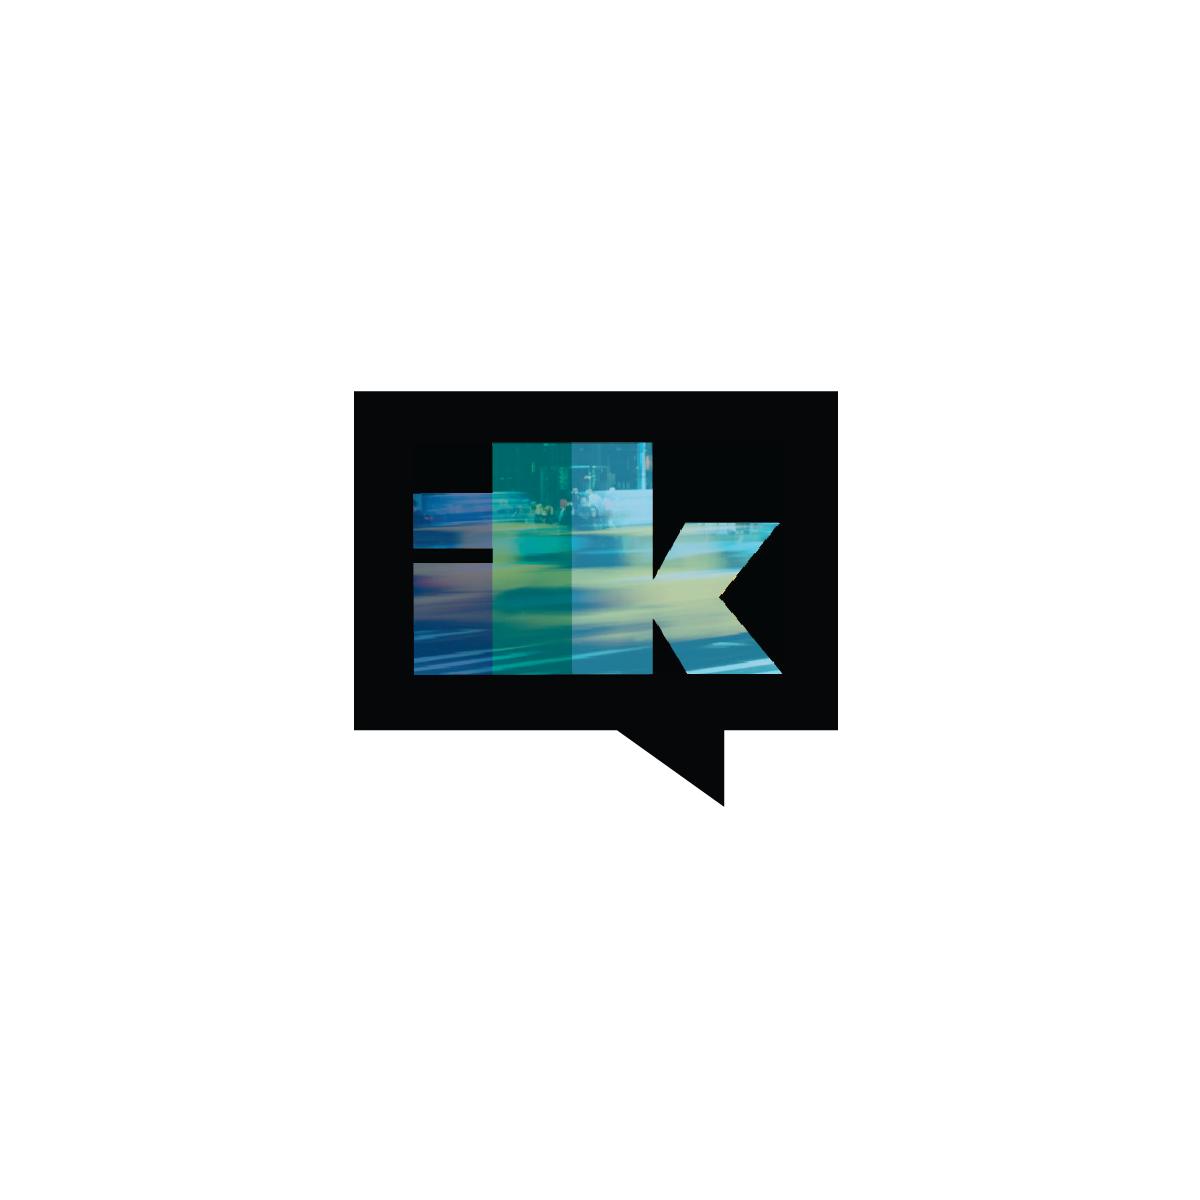 ilk_logo1_New-01.png